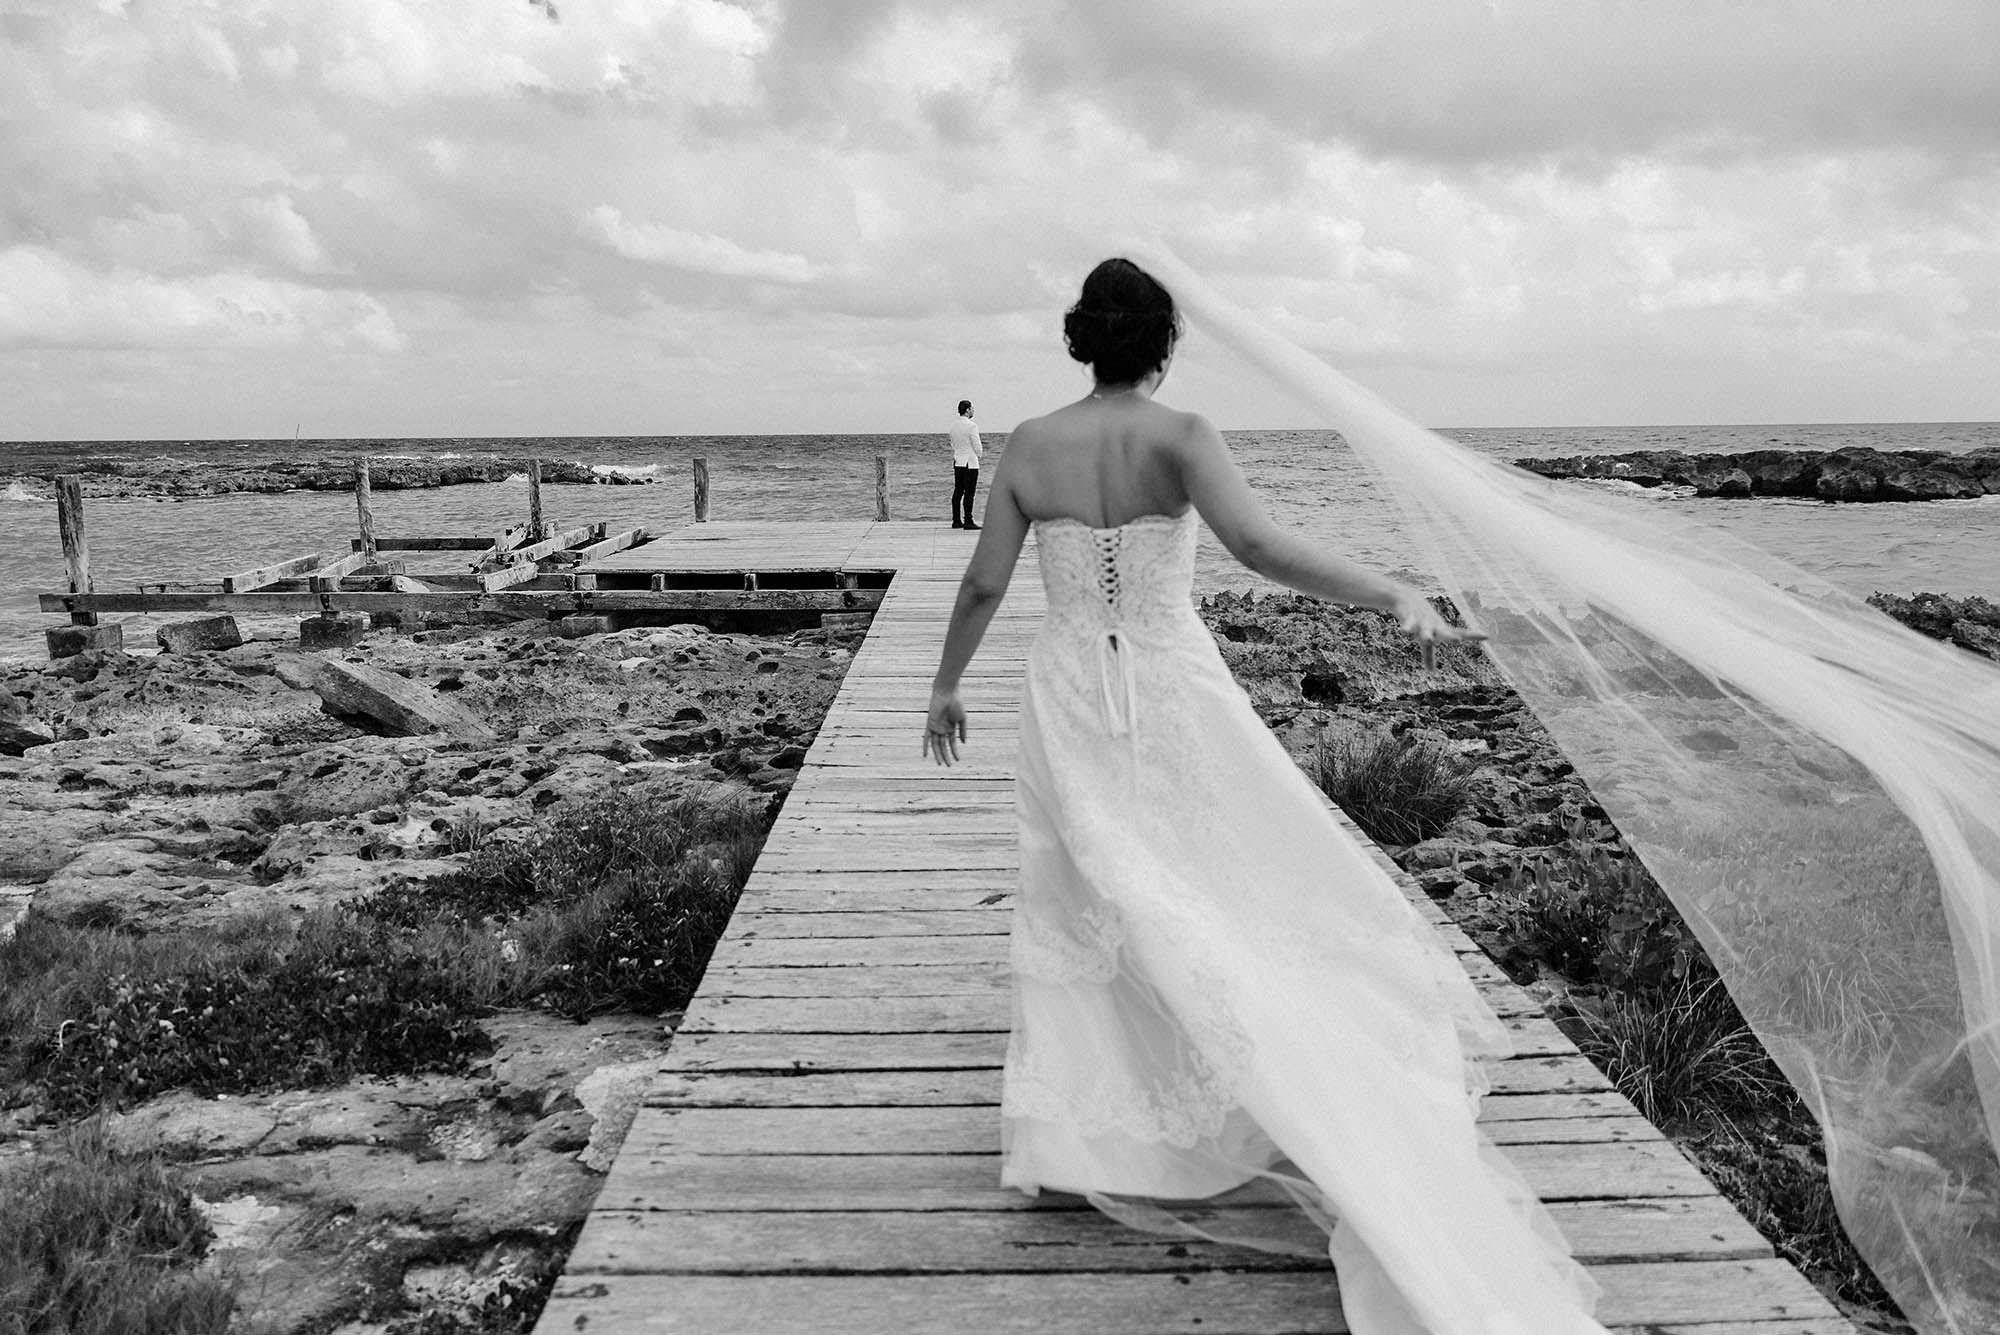 Wedding playa del carmen planner destination mexico magali espinosa15-WEB.jpg